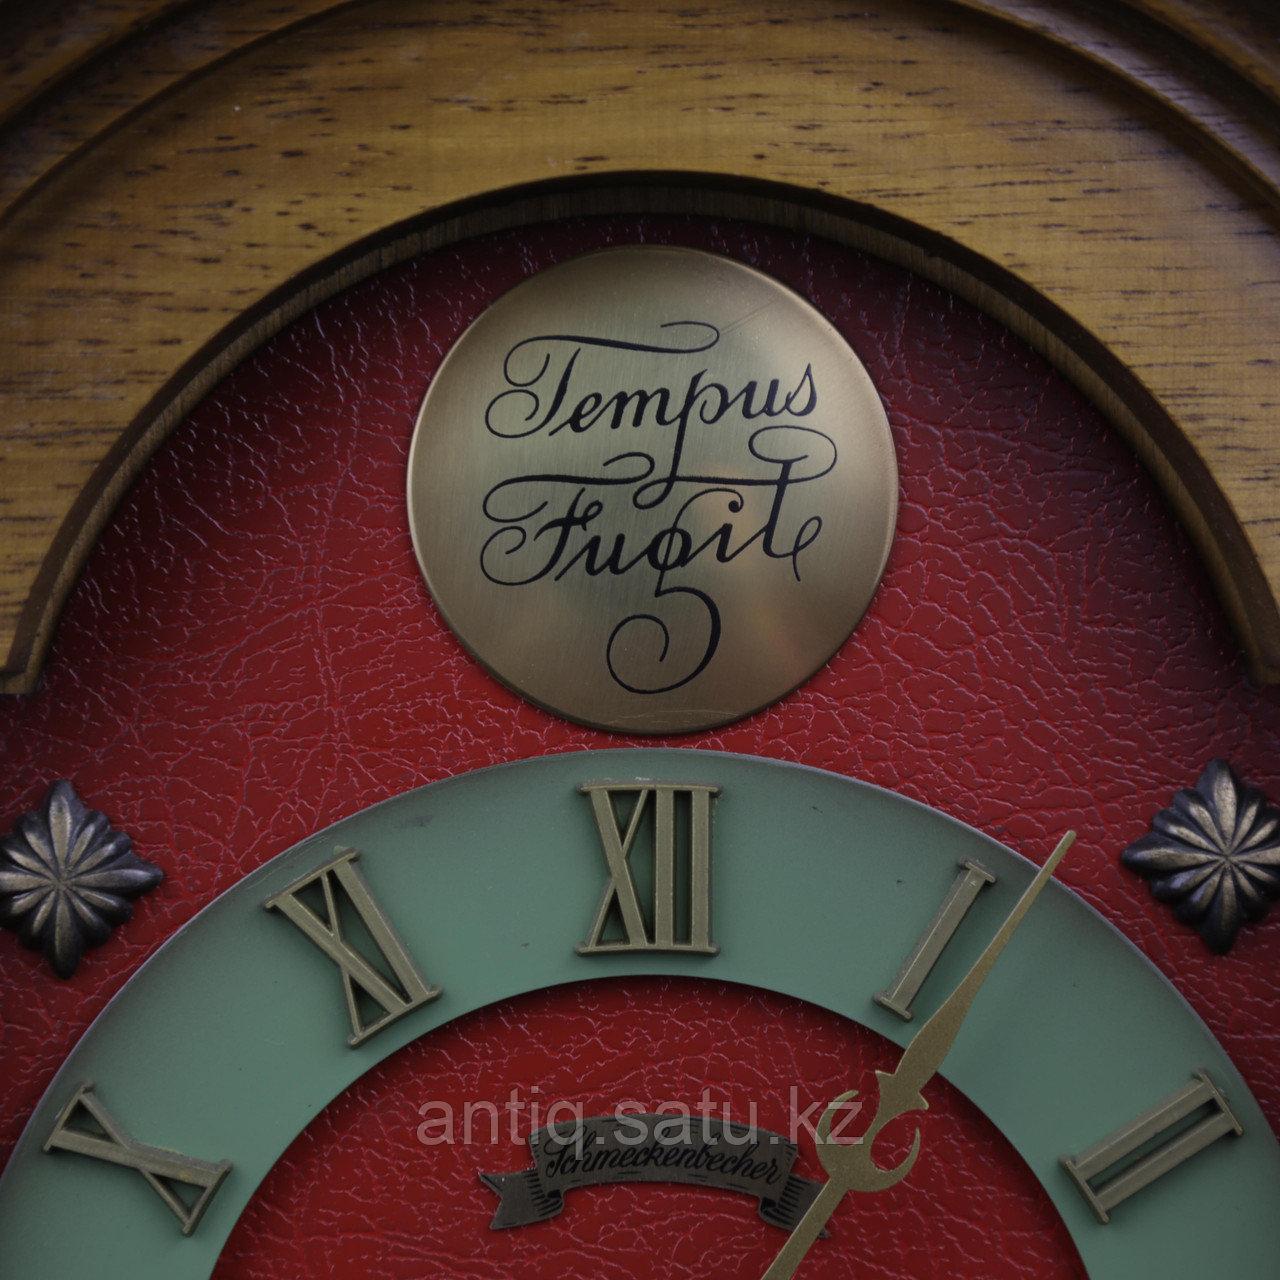 Настольные часы. Часовая мастерская Emil Schmeckenbecher - фото 7